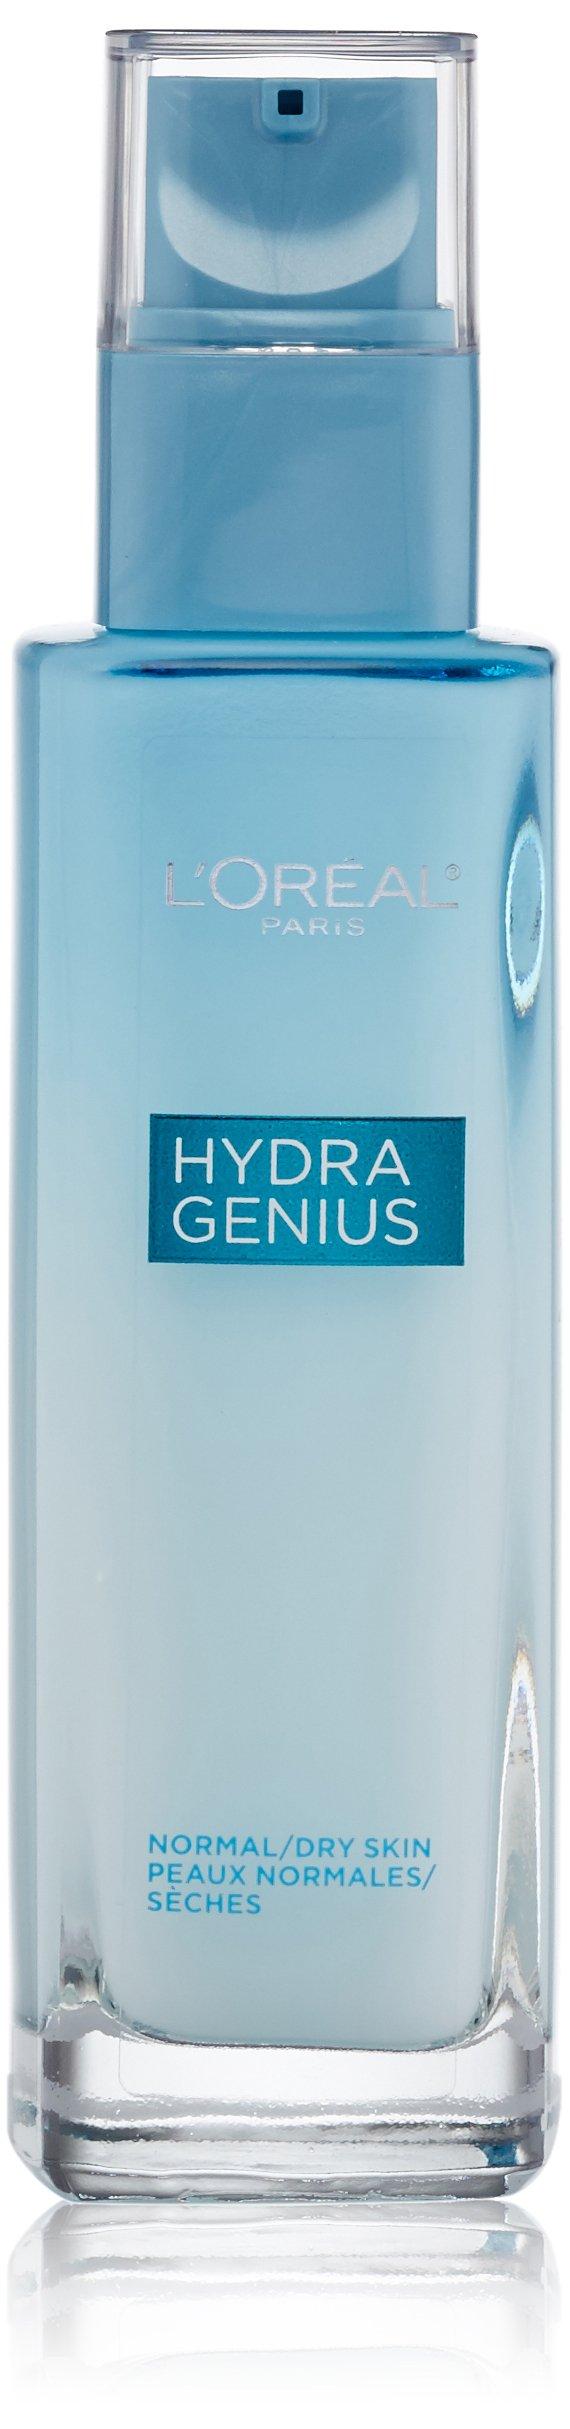 L'Oreal Paris Hydra Genius Daily Liquid Care Normal/Dry Skin 3.04 fl. oz. by L'Oreal Paris